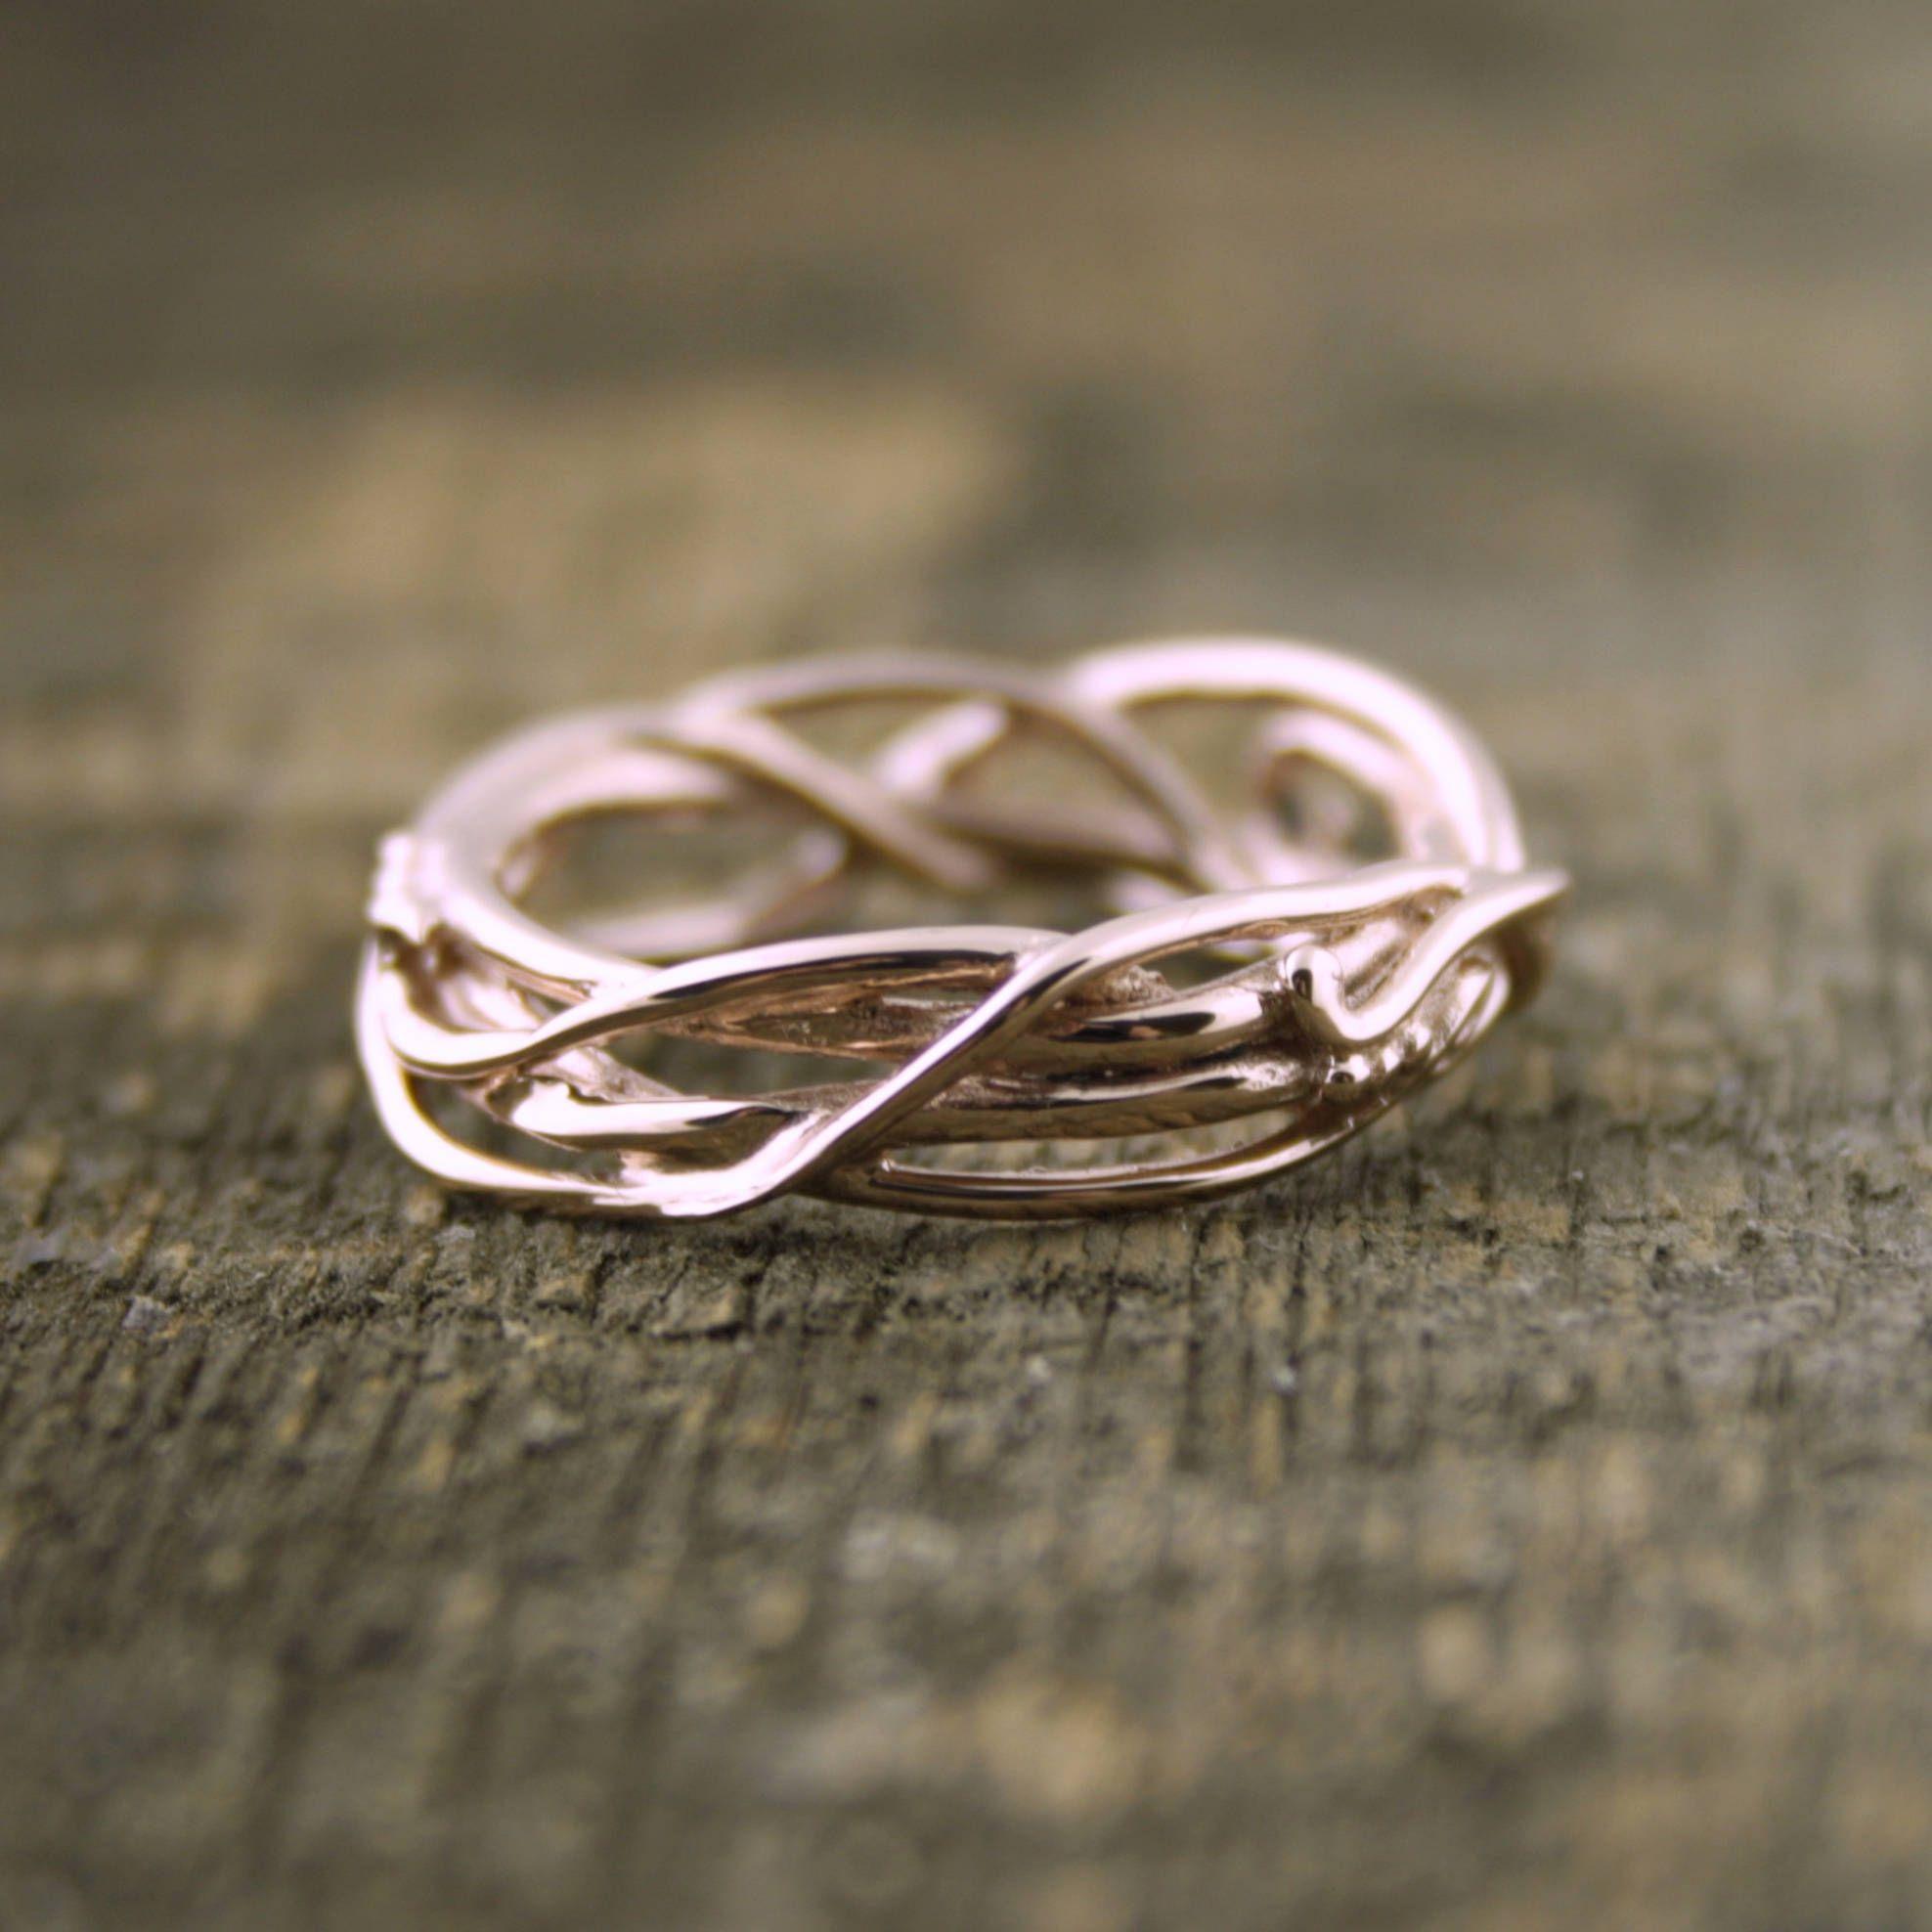 14kt Rose Gold Elvin Flowanic Whimsical Engagement Ring Wedding Band, Anic Band, Twig Rings, Vine Ring, Goddess Ring, Branch Ring